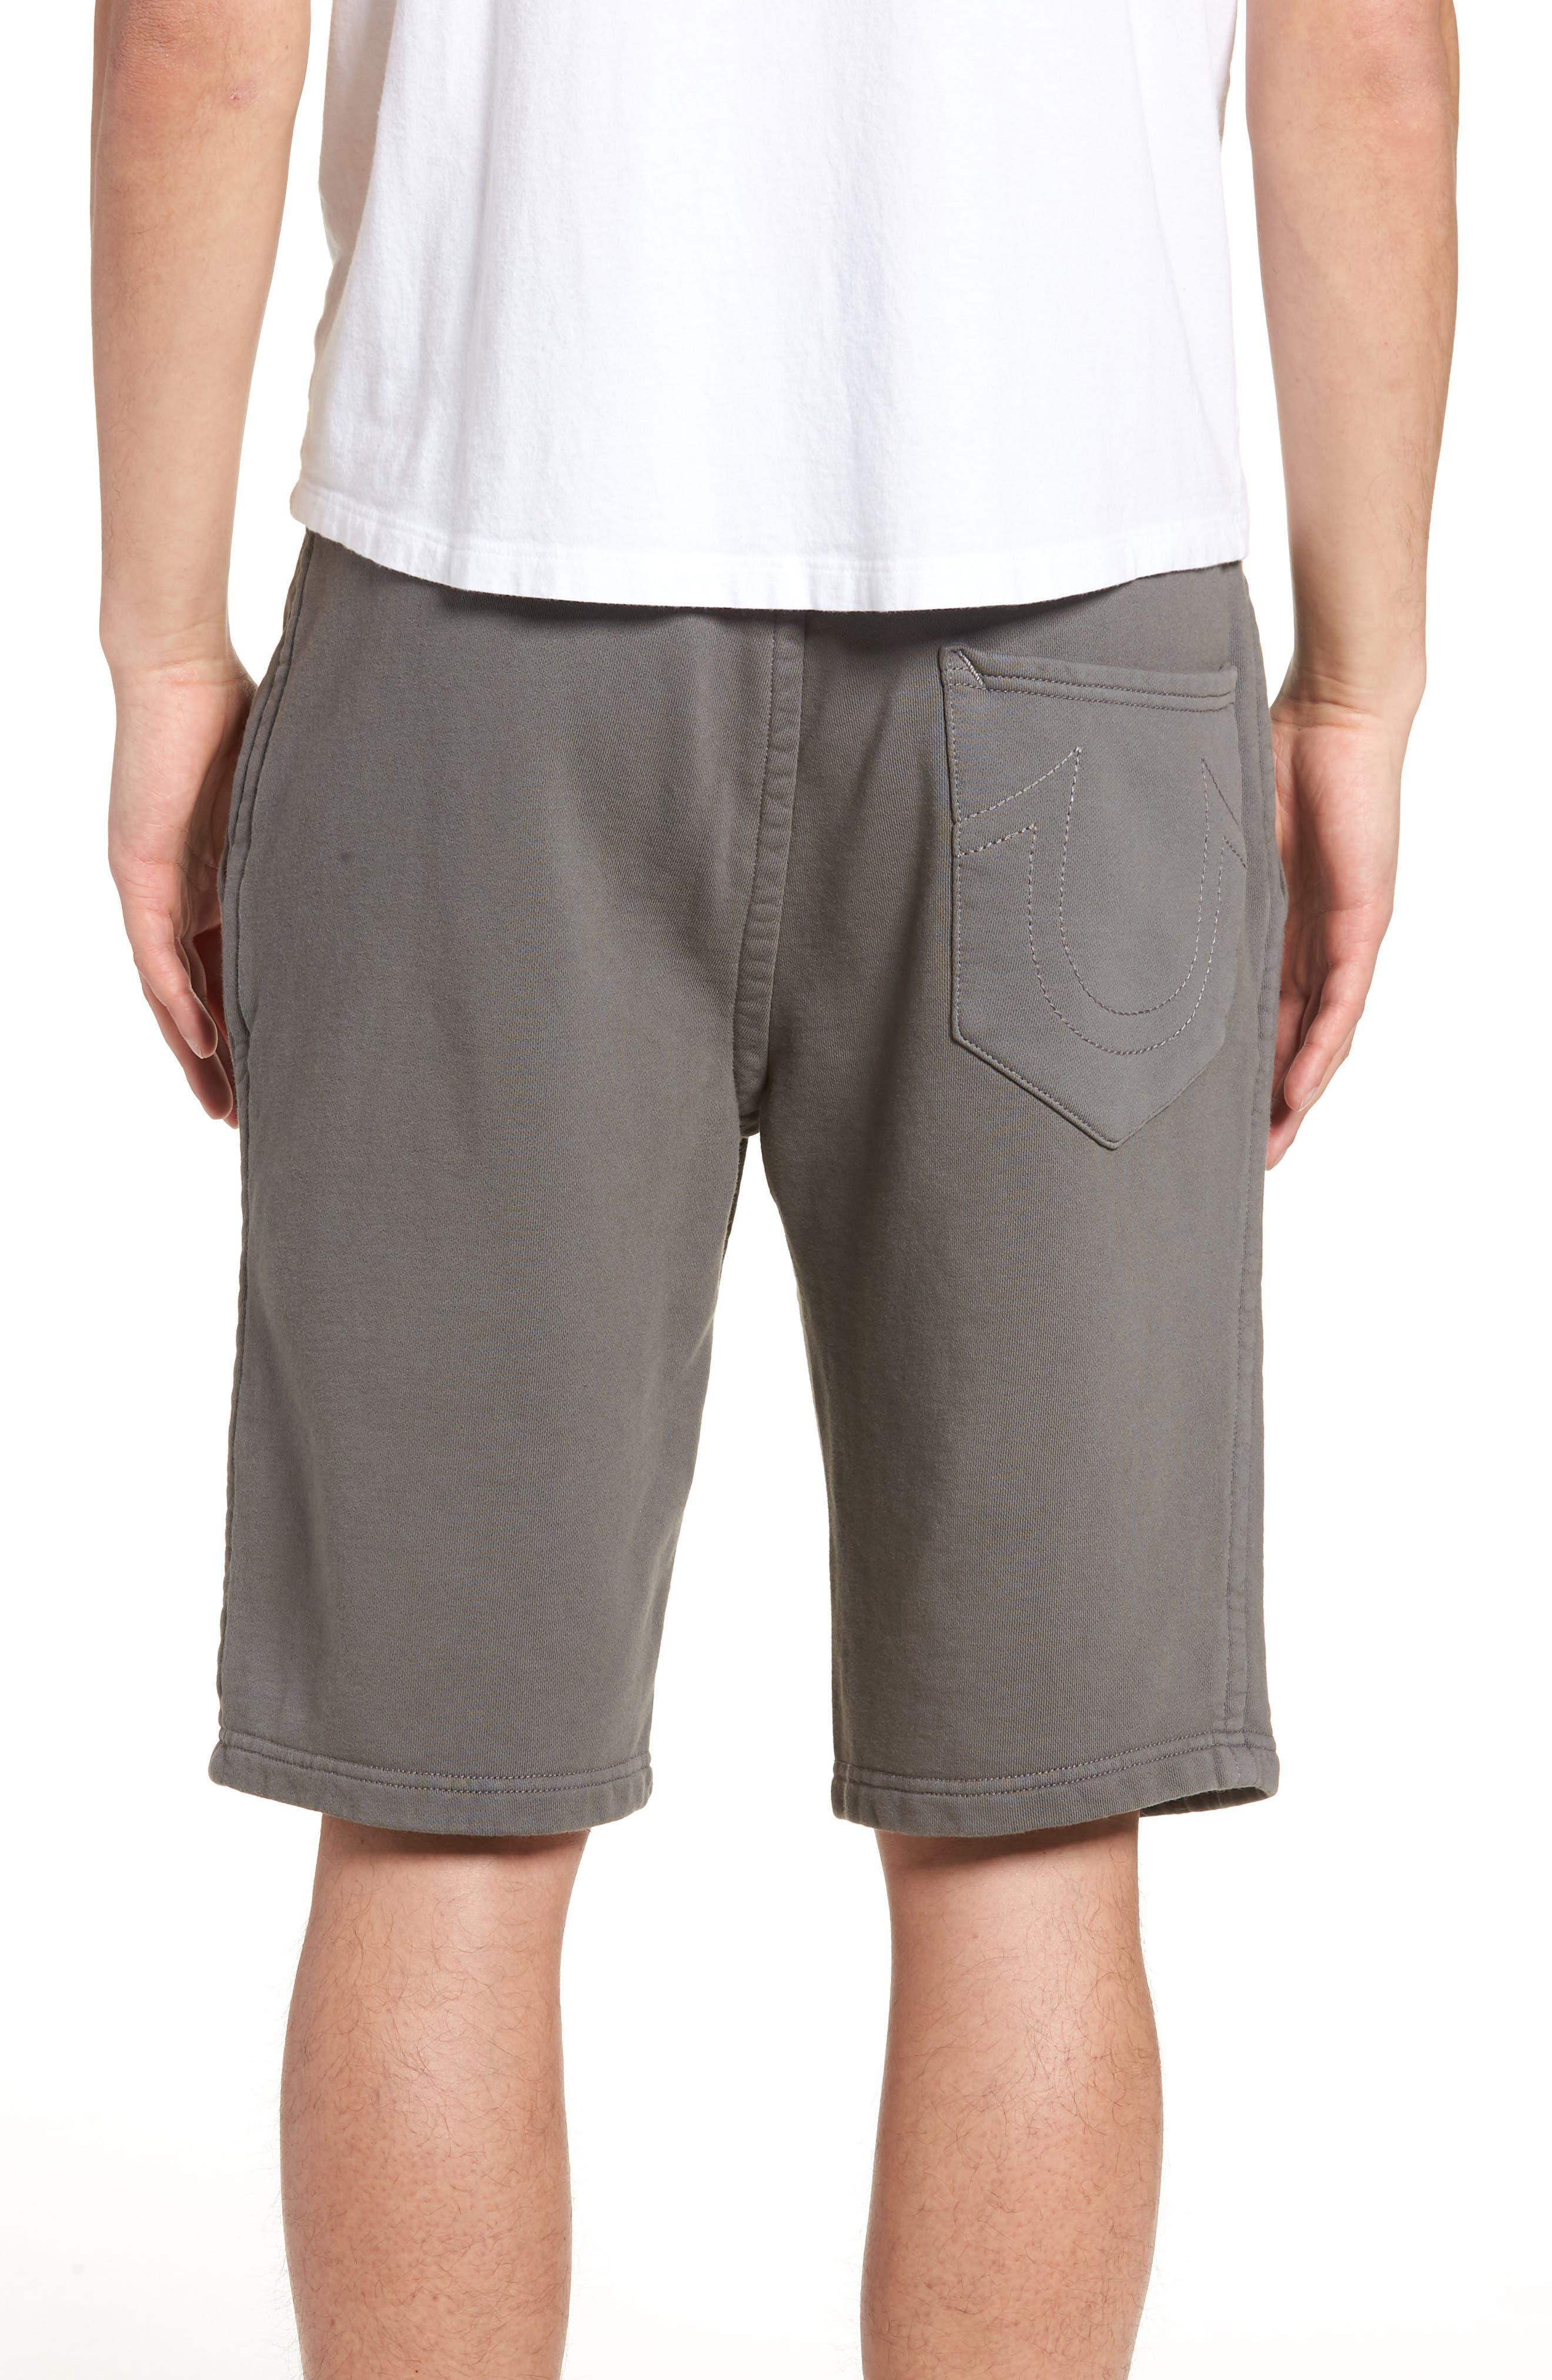 Core Shorts,                             Alternate thumbnail 2, color,                             CHARCOAL